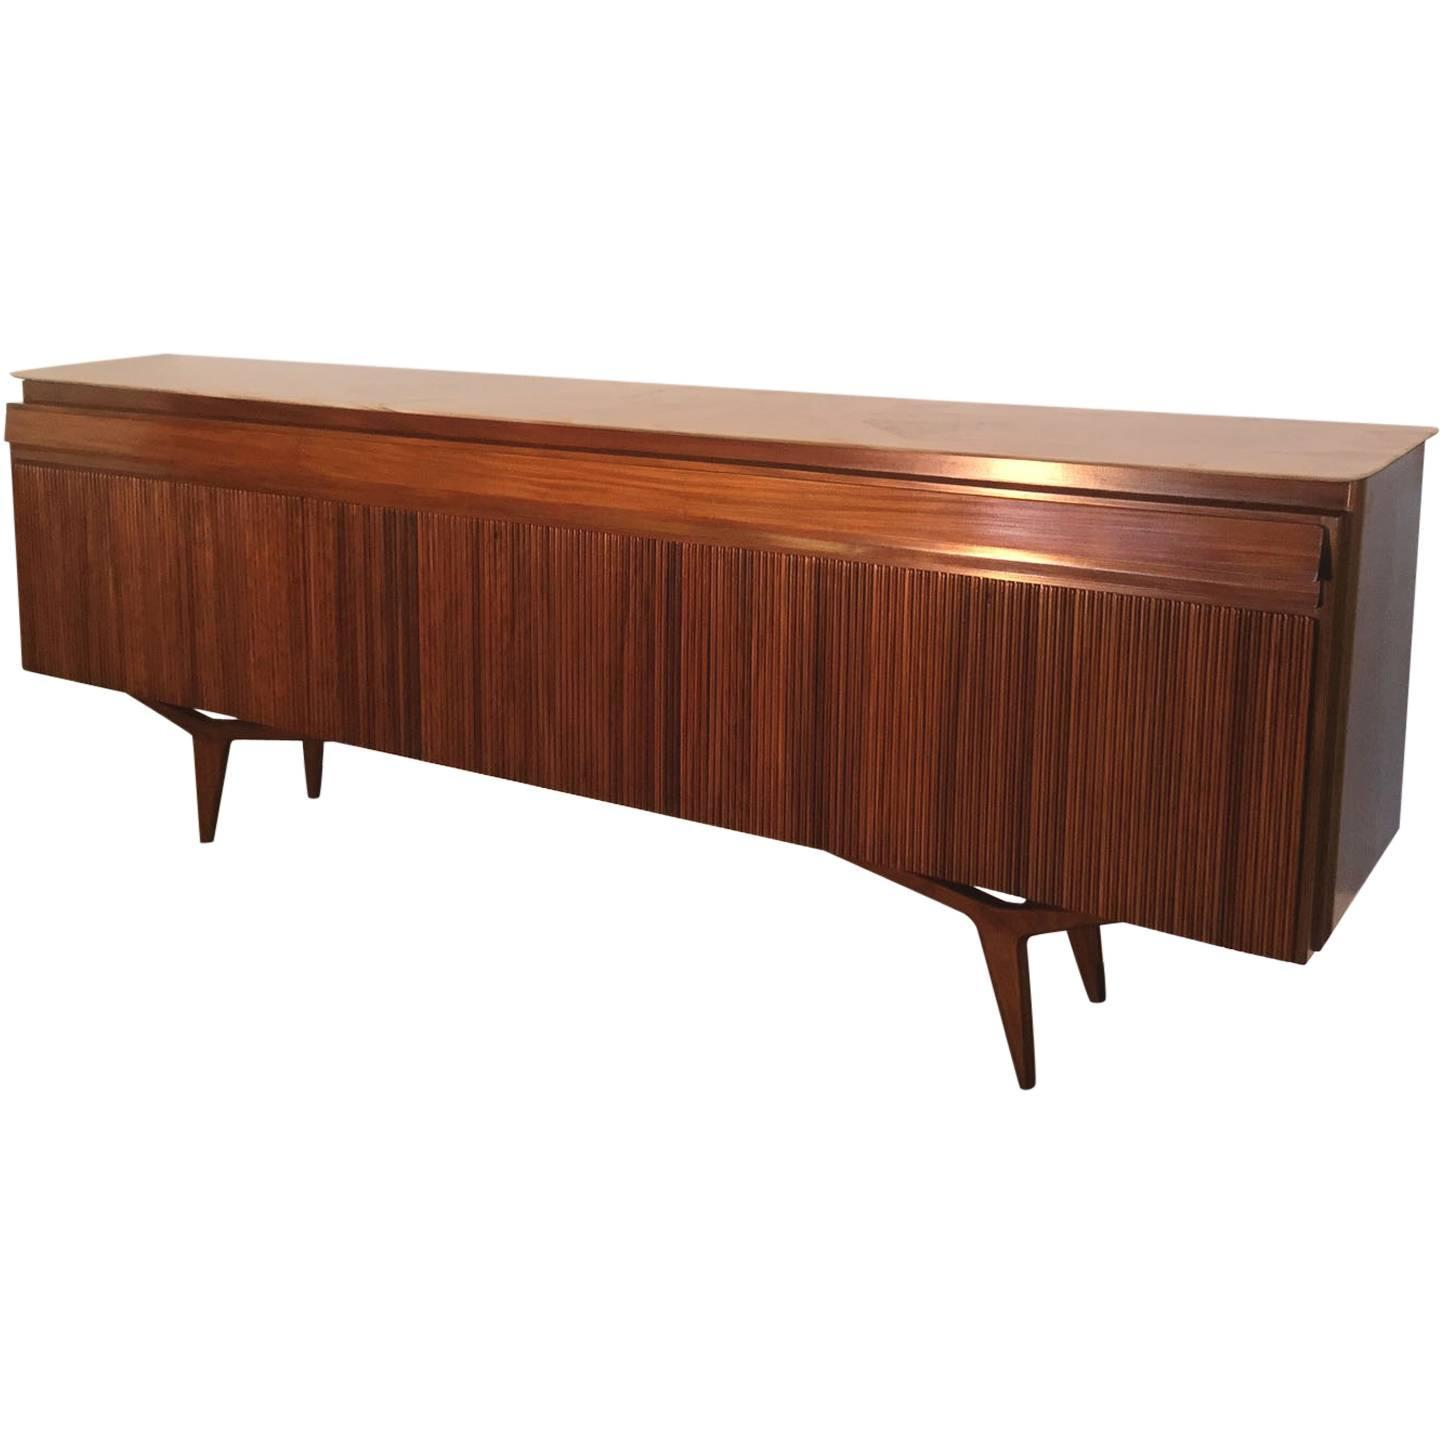 exceptional large mahogany sideboard at 1stdibs. Black Bedroom Furniture Sets. Home Design Ideas